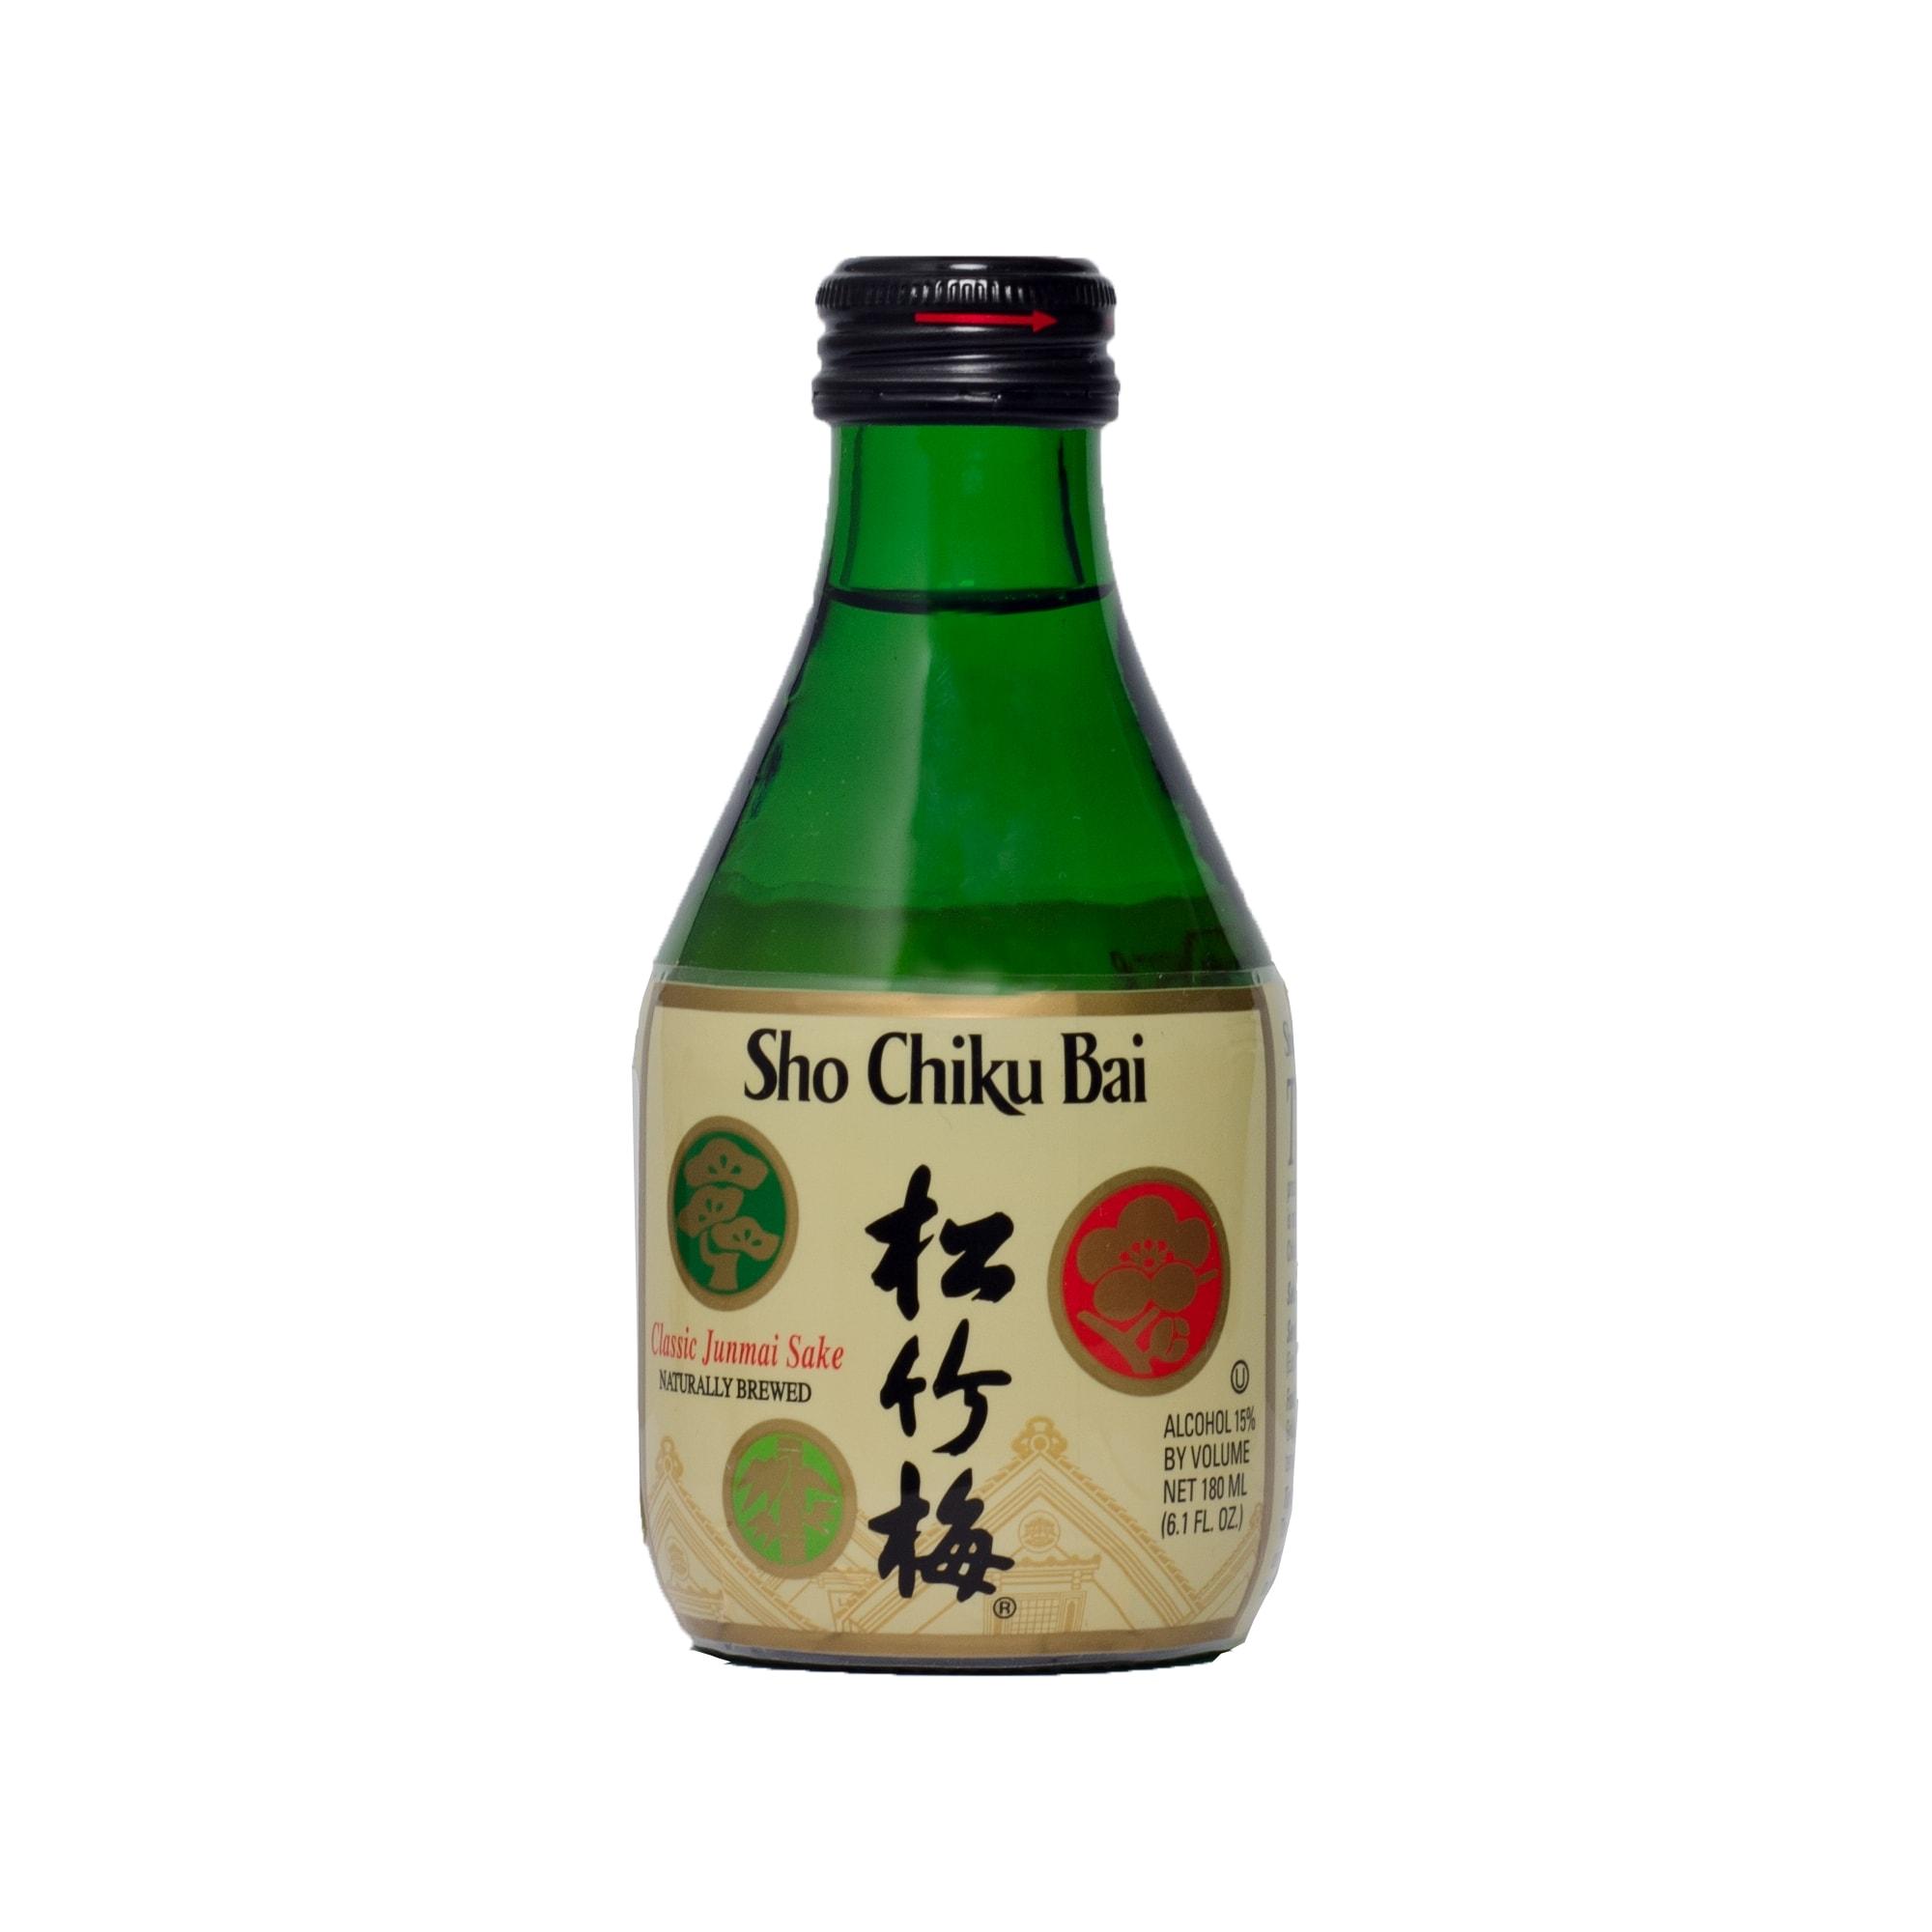 Takara Sho Chiku Bai Sake Reiswein 15% Alkohol 180 ml